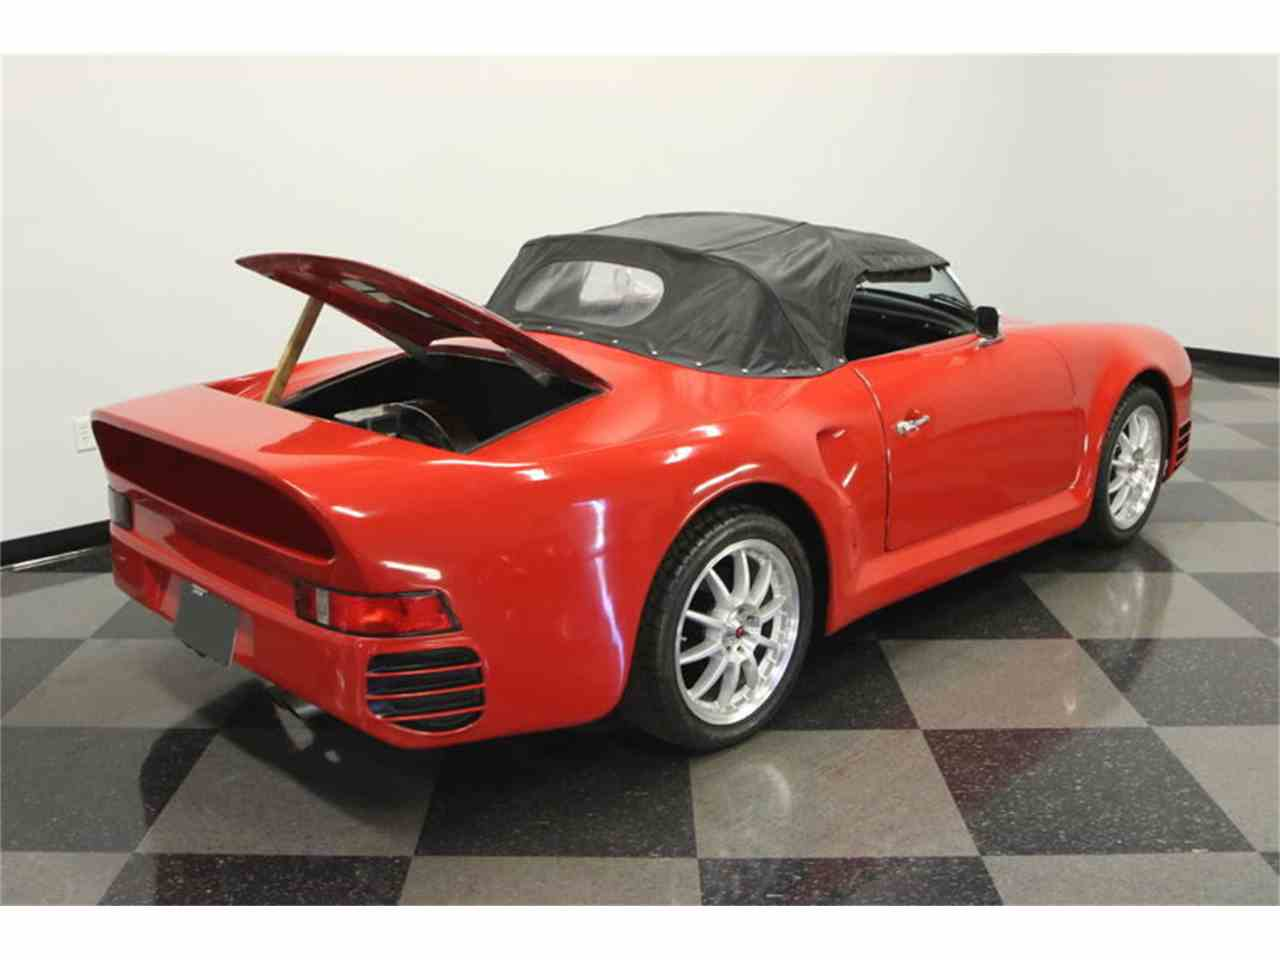 Large Picture of '94 Porsche 359 Replica located in Florida Offered by Bob's Classics, Inc. - LTAU